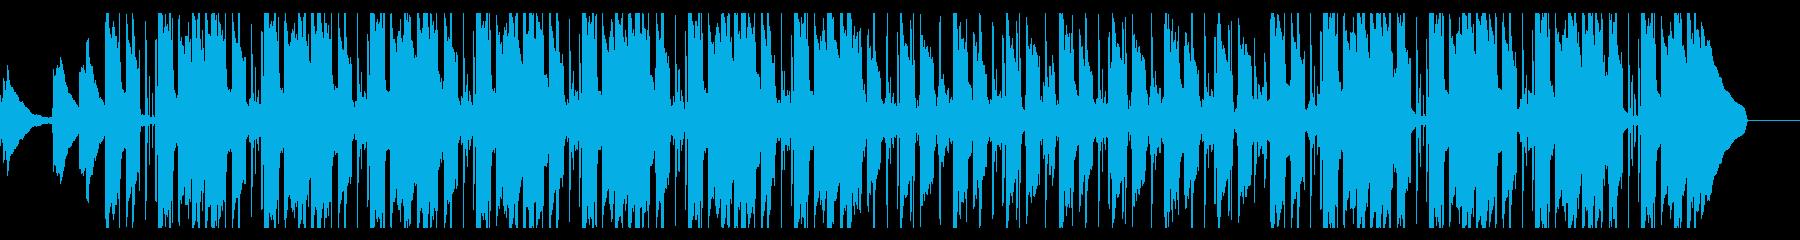 【LoFi hiphop】 チルピアノの再生済みの波形